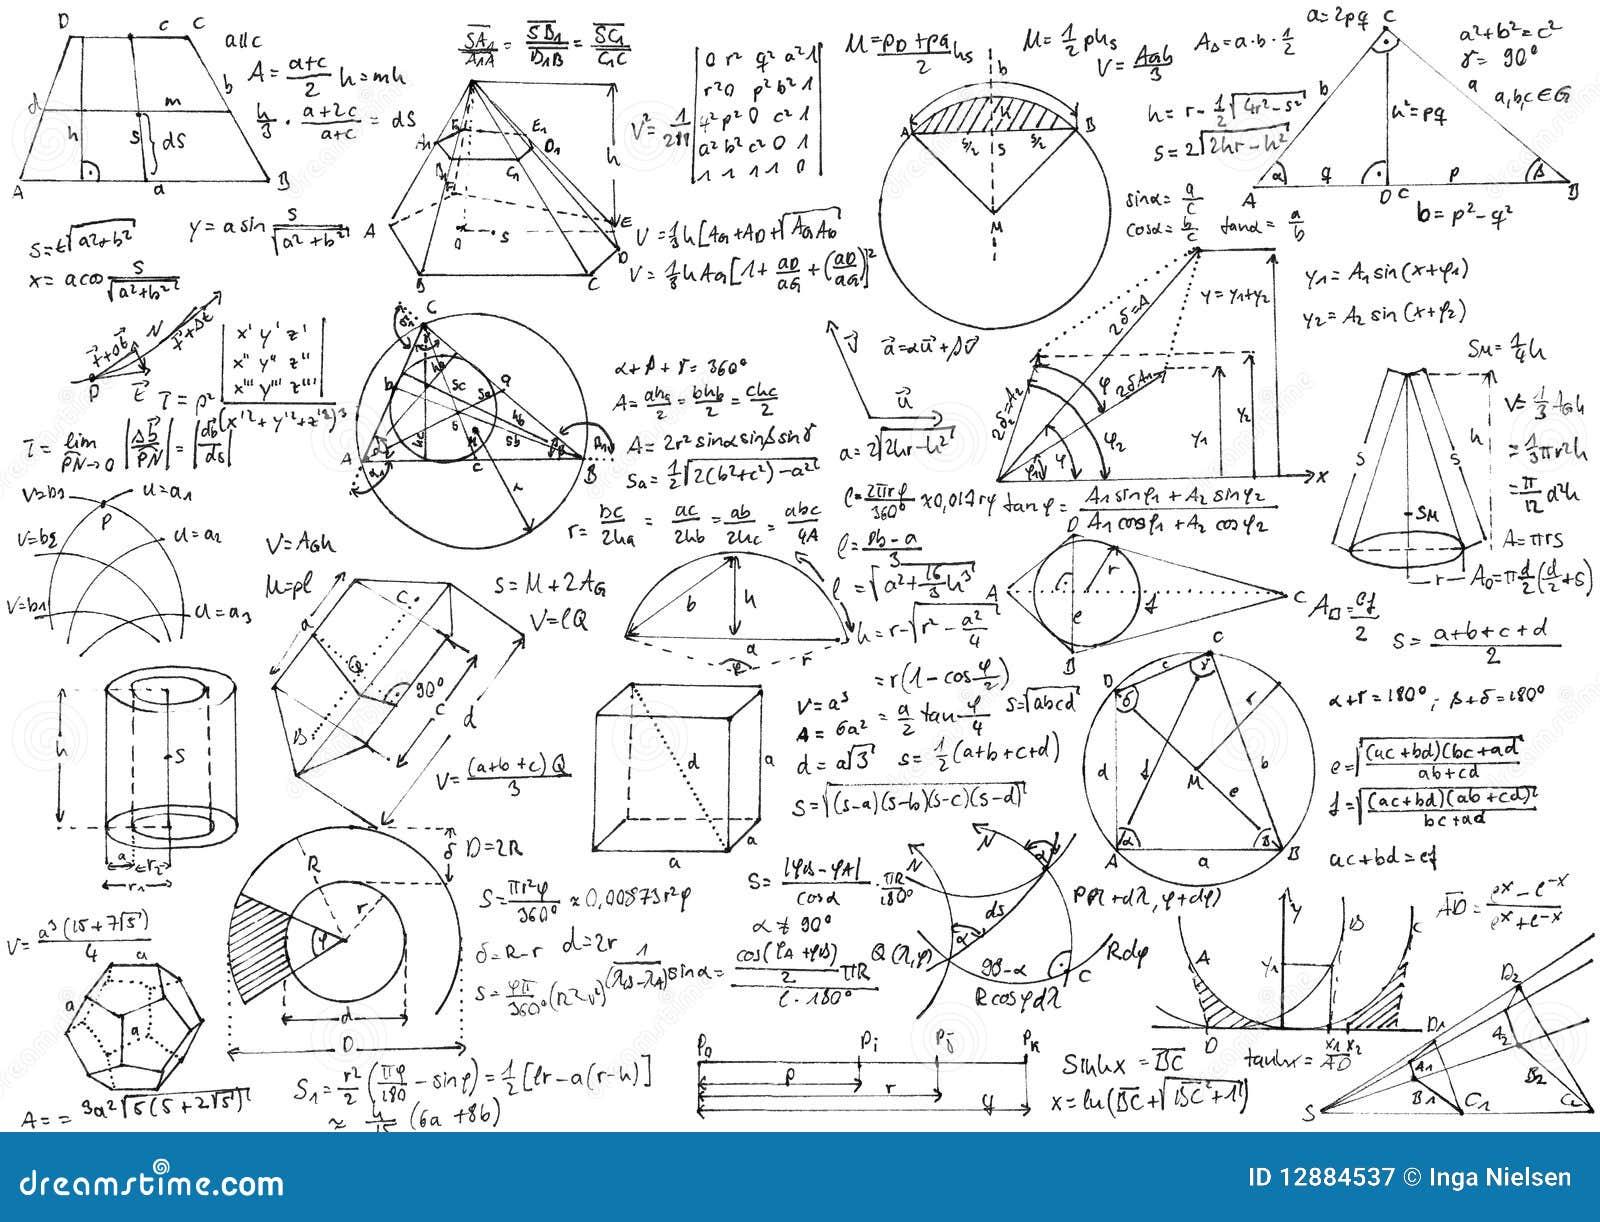 Psu Engineering Design Sketches